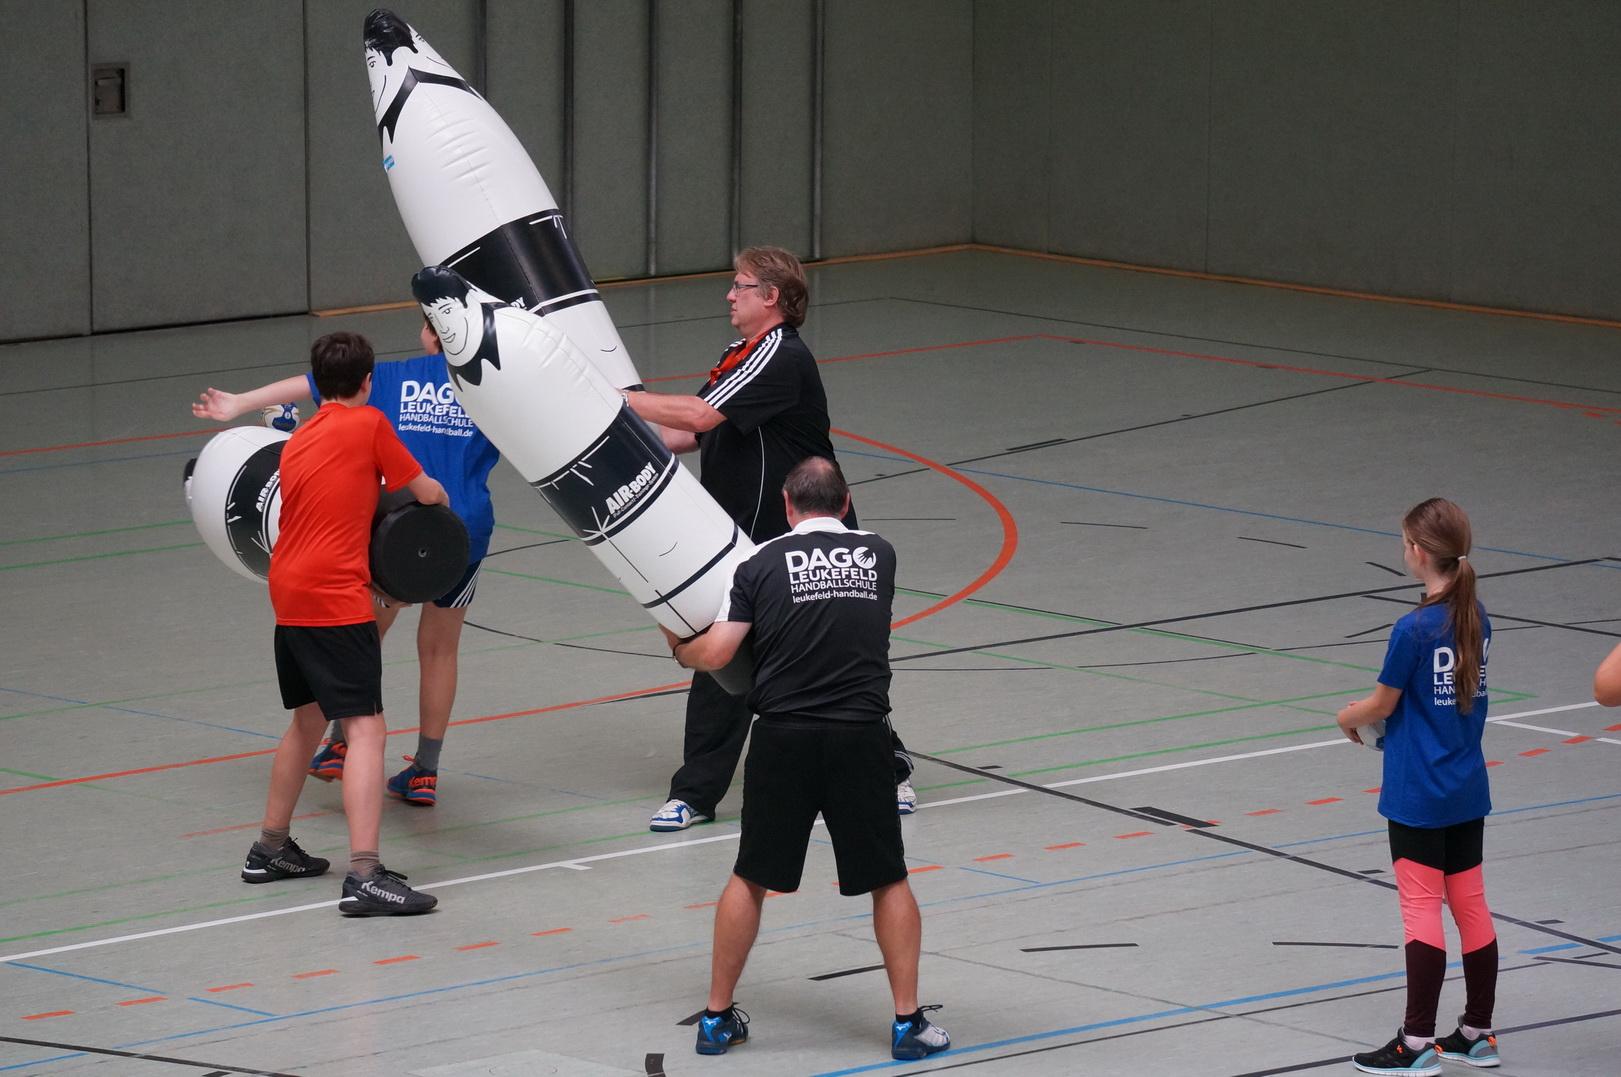 201808_Handballcamp_SDH_MG_264w